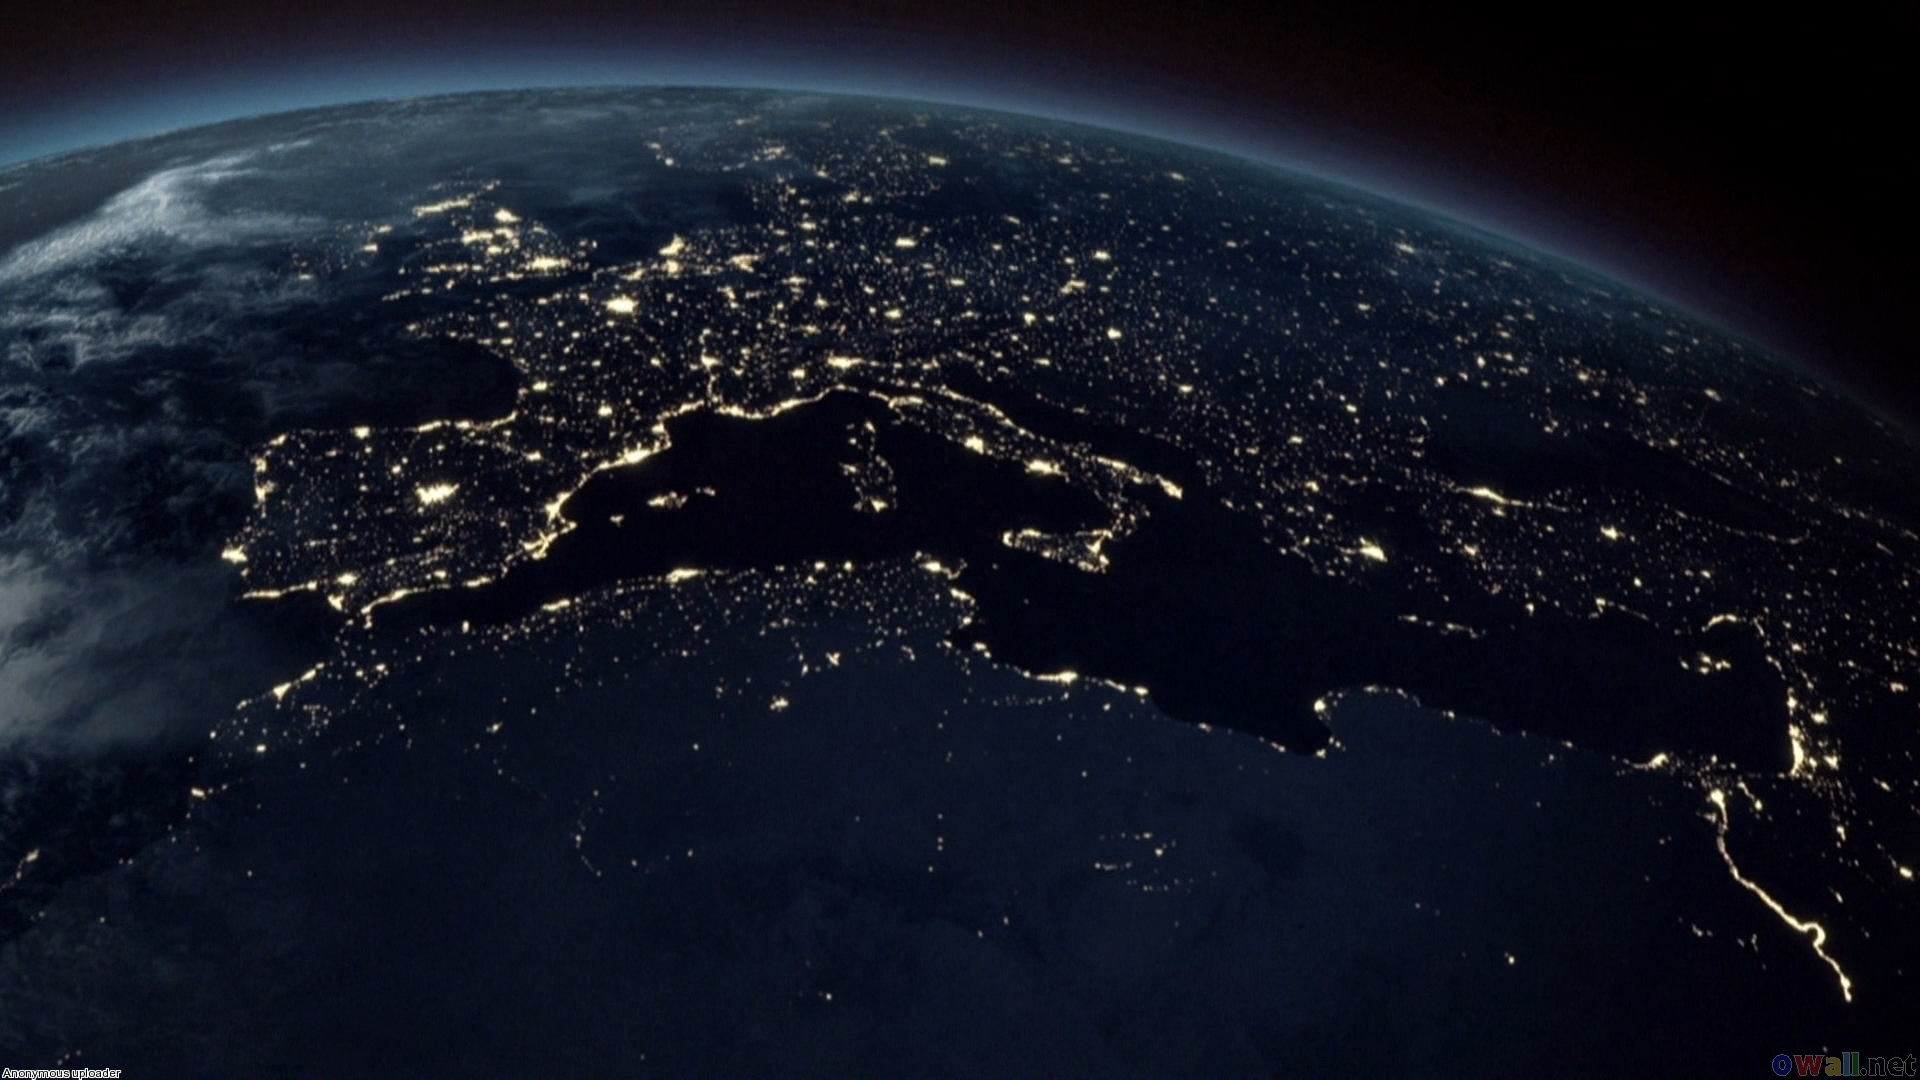 Earth at Night | Europe Hd Wallpaper | Wide Screen ...